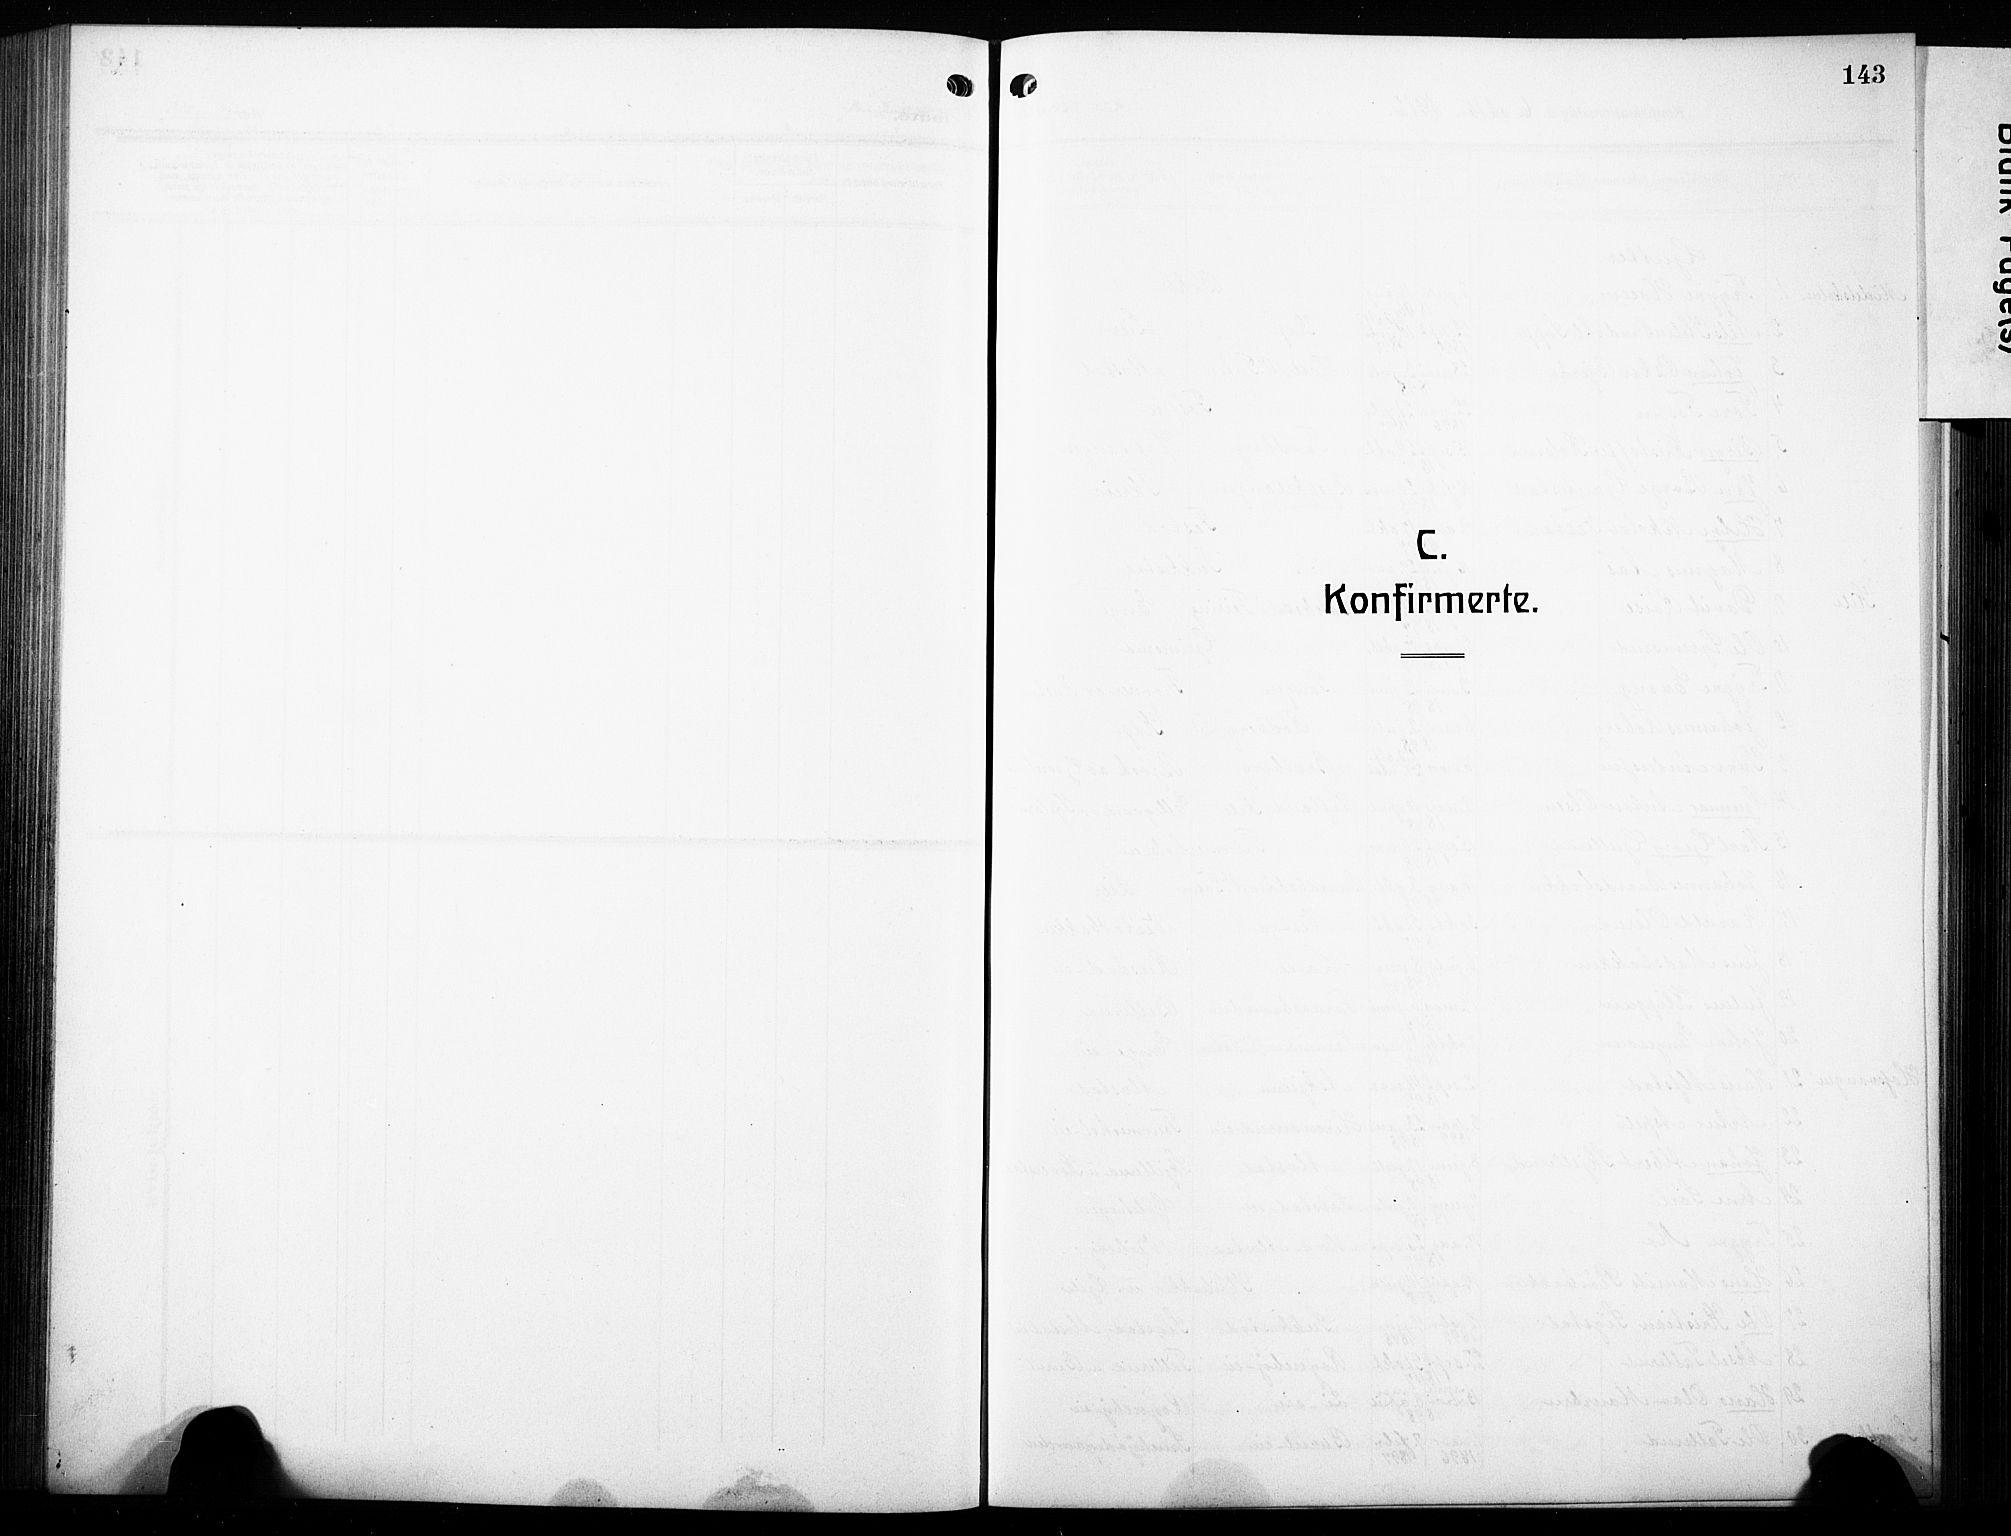 SAH, Østre Toten prestekontor, Klokkerbok nr. 10, 1912-1933, s. 143